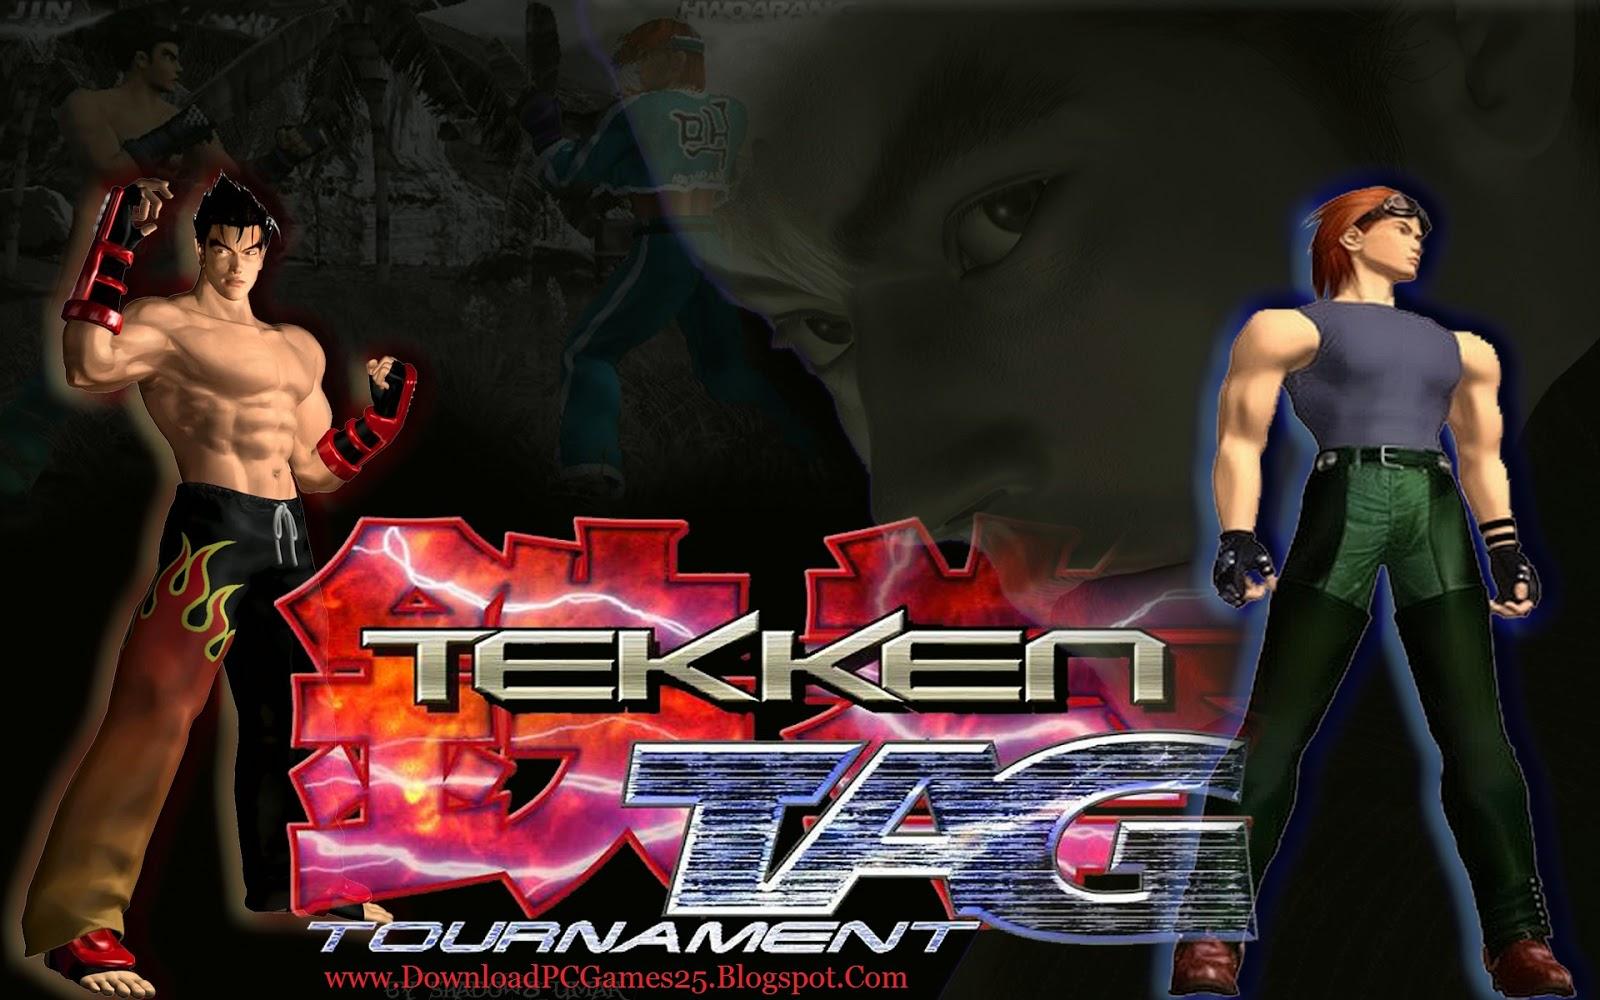 Tekken tag tournament 2 download full version compressed free.